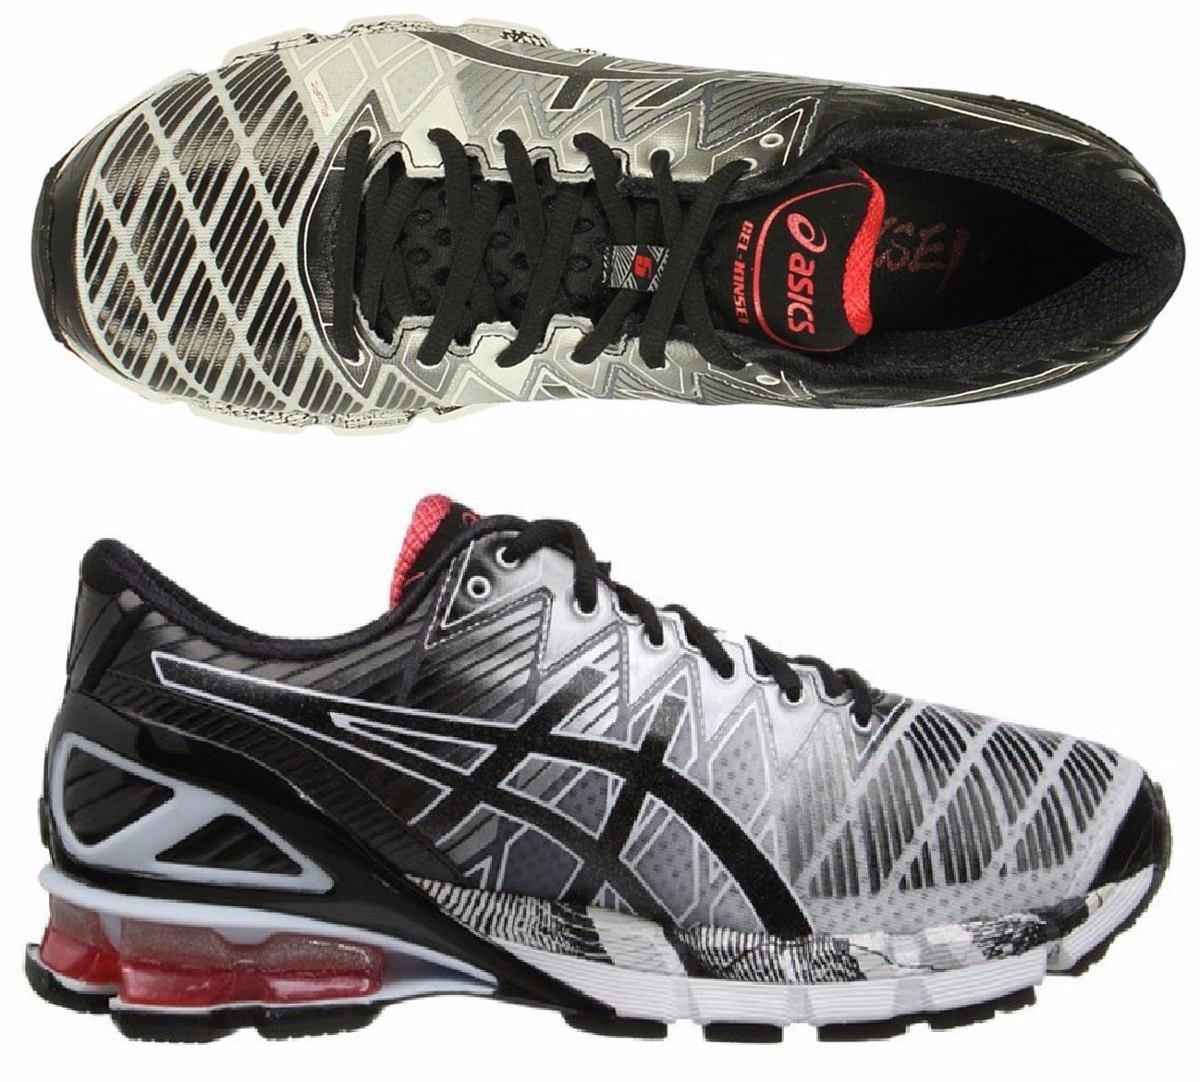 d15c223e7204fe tênis asics kinsei 5 gel running masculino cinza e preto. Carregando zoom.